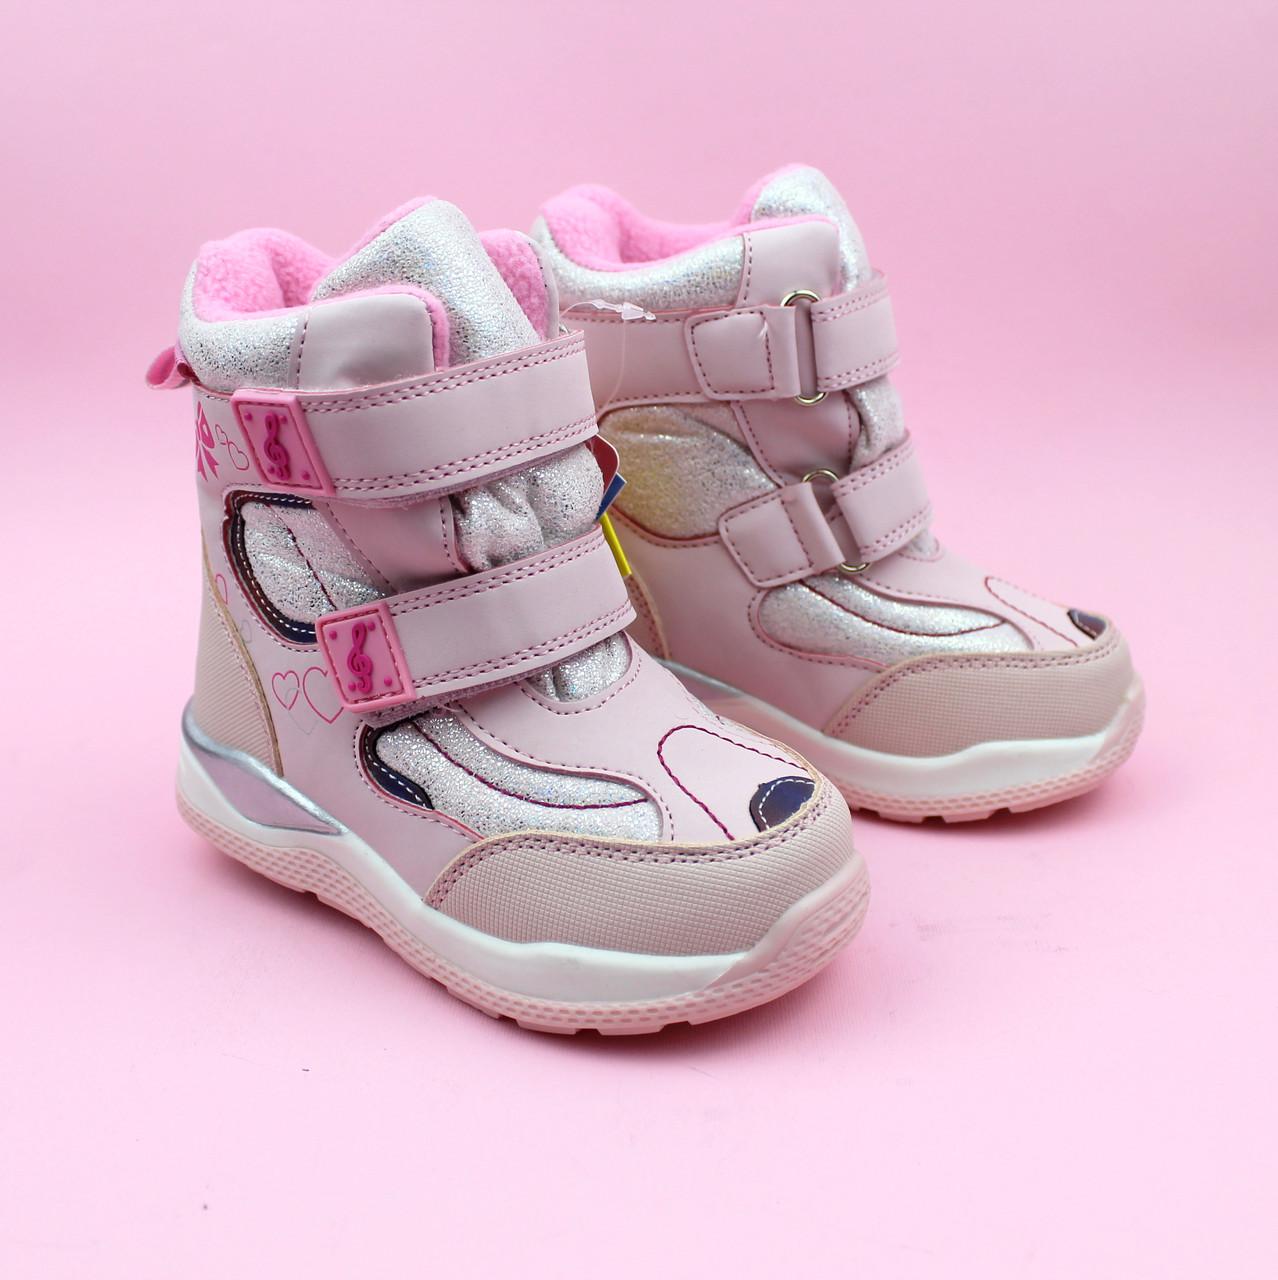 Термо ботинки розовые для девочки тм Том.м размер 25,26,28